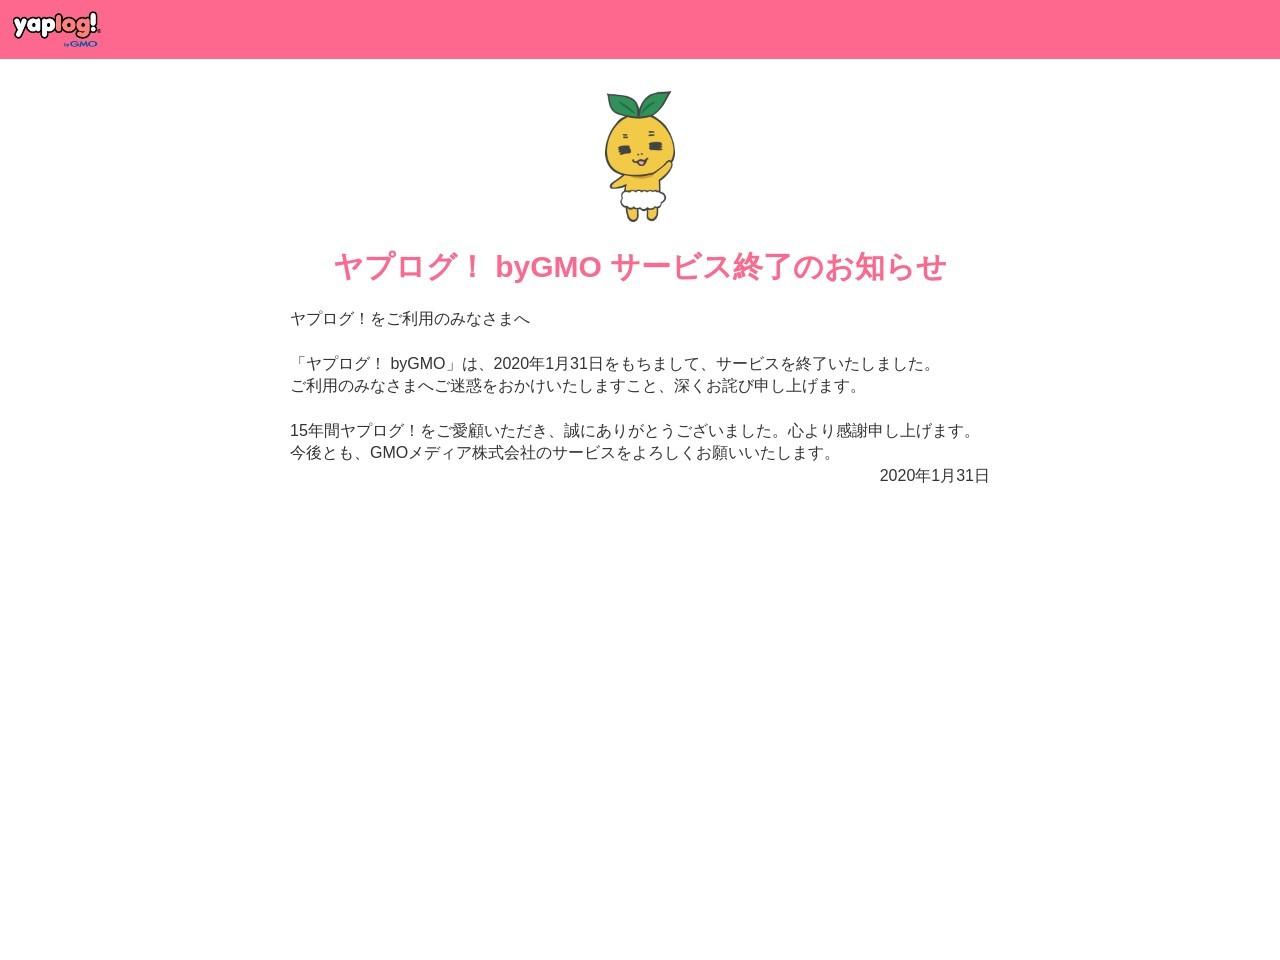 http://yaplog.jp/perbacco